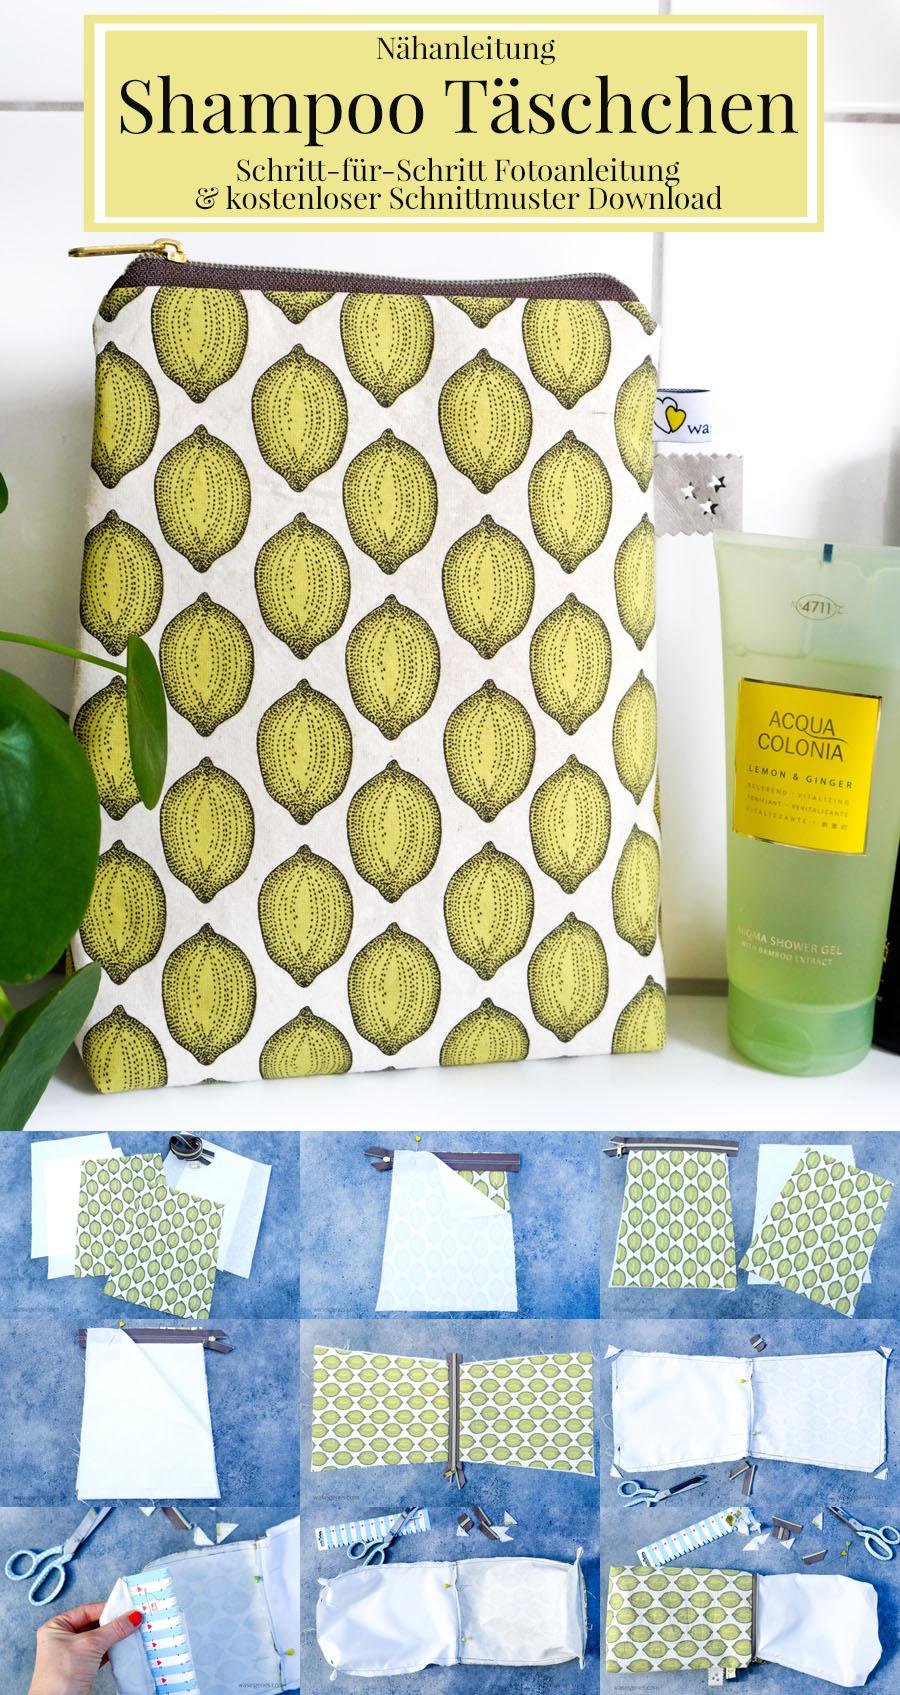 Nähanleitung Shampoo Täschchen | Schritt für Schritt Fotoanleitung | Tasche für Shampoo & Duschgel selber nähen | waseigenes.com DIY Blog